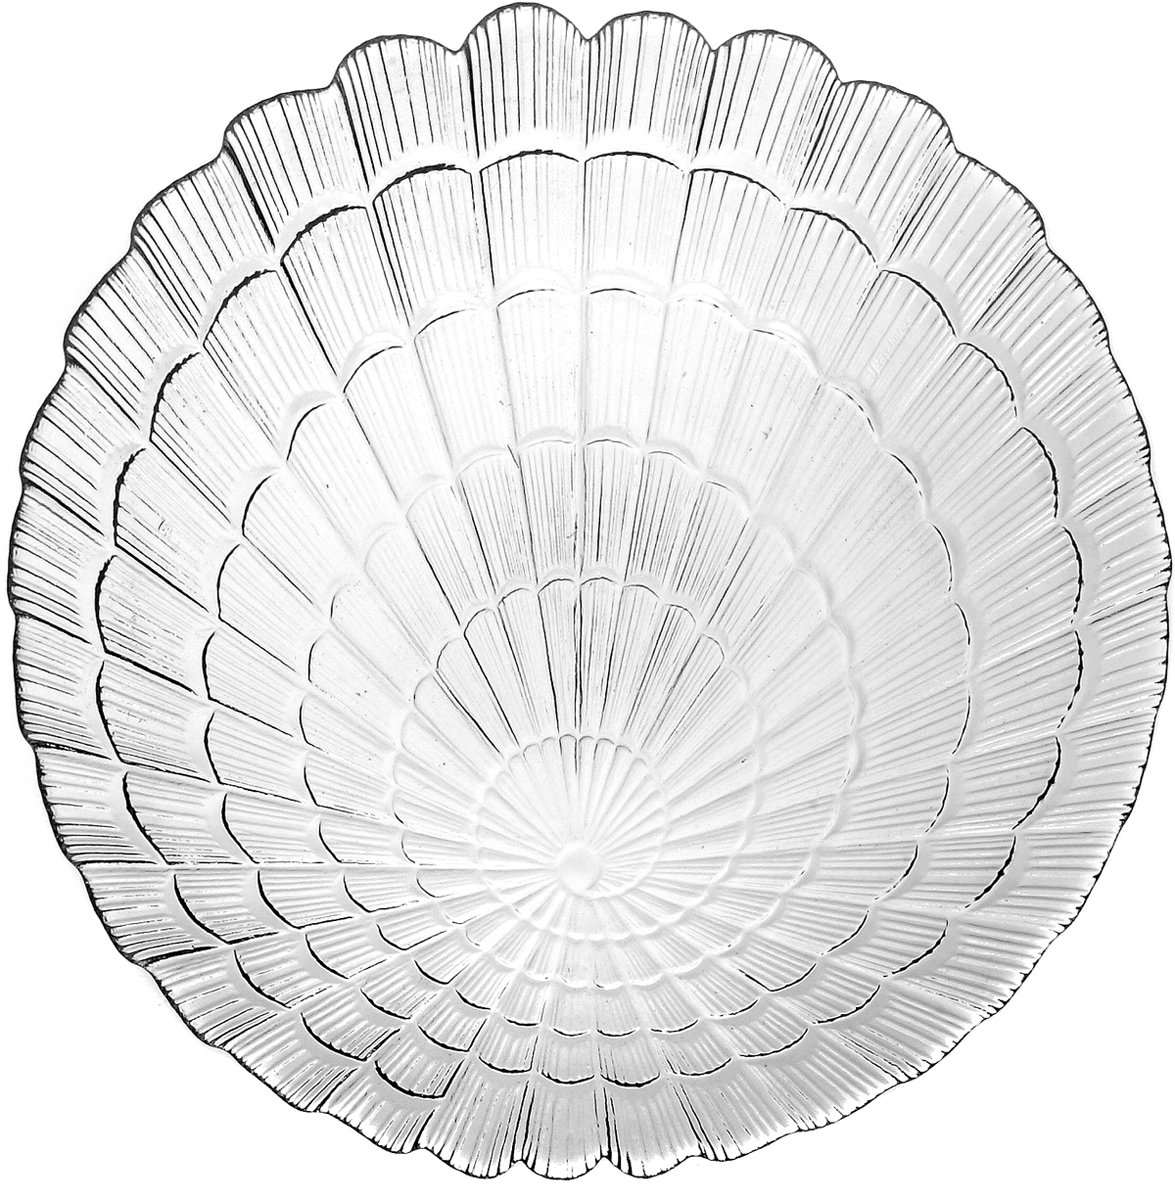 Тарелка Pasabahce Атлантис, цвет: прозрачный, диаметр 24 см10236SLBТарелка из закаленного стекла ATLANTIS 240 мм (прозрачное рифленое стекло)